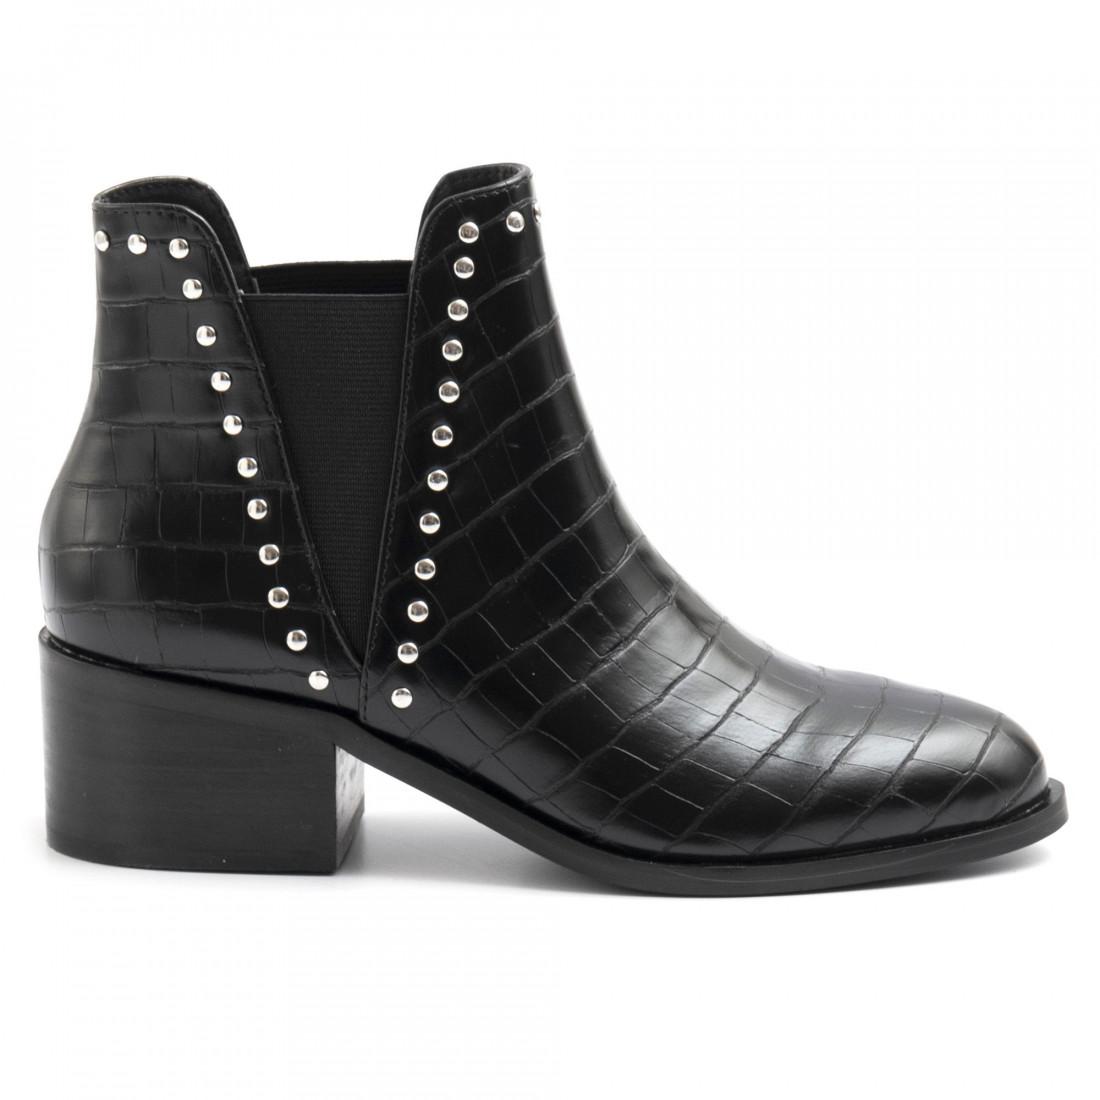 Steve Madden Cade Ankle Boot Black Croco